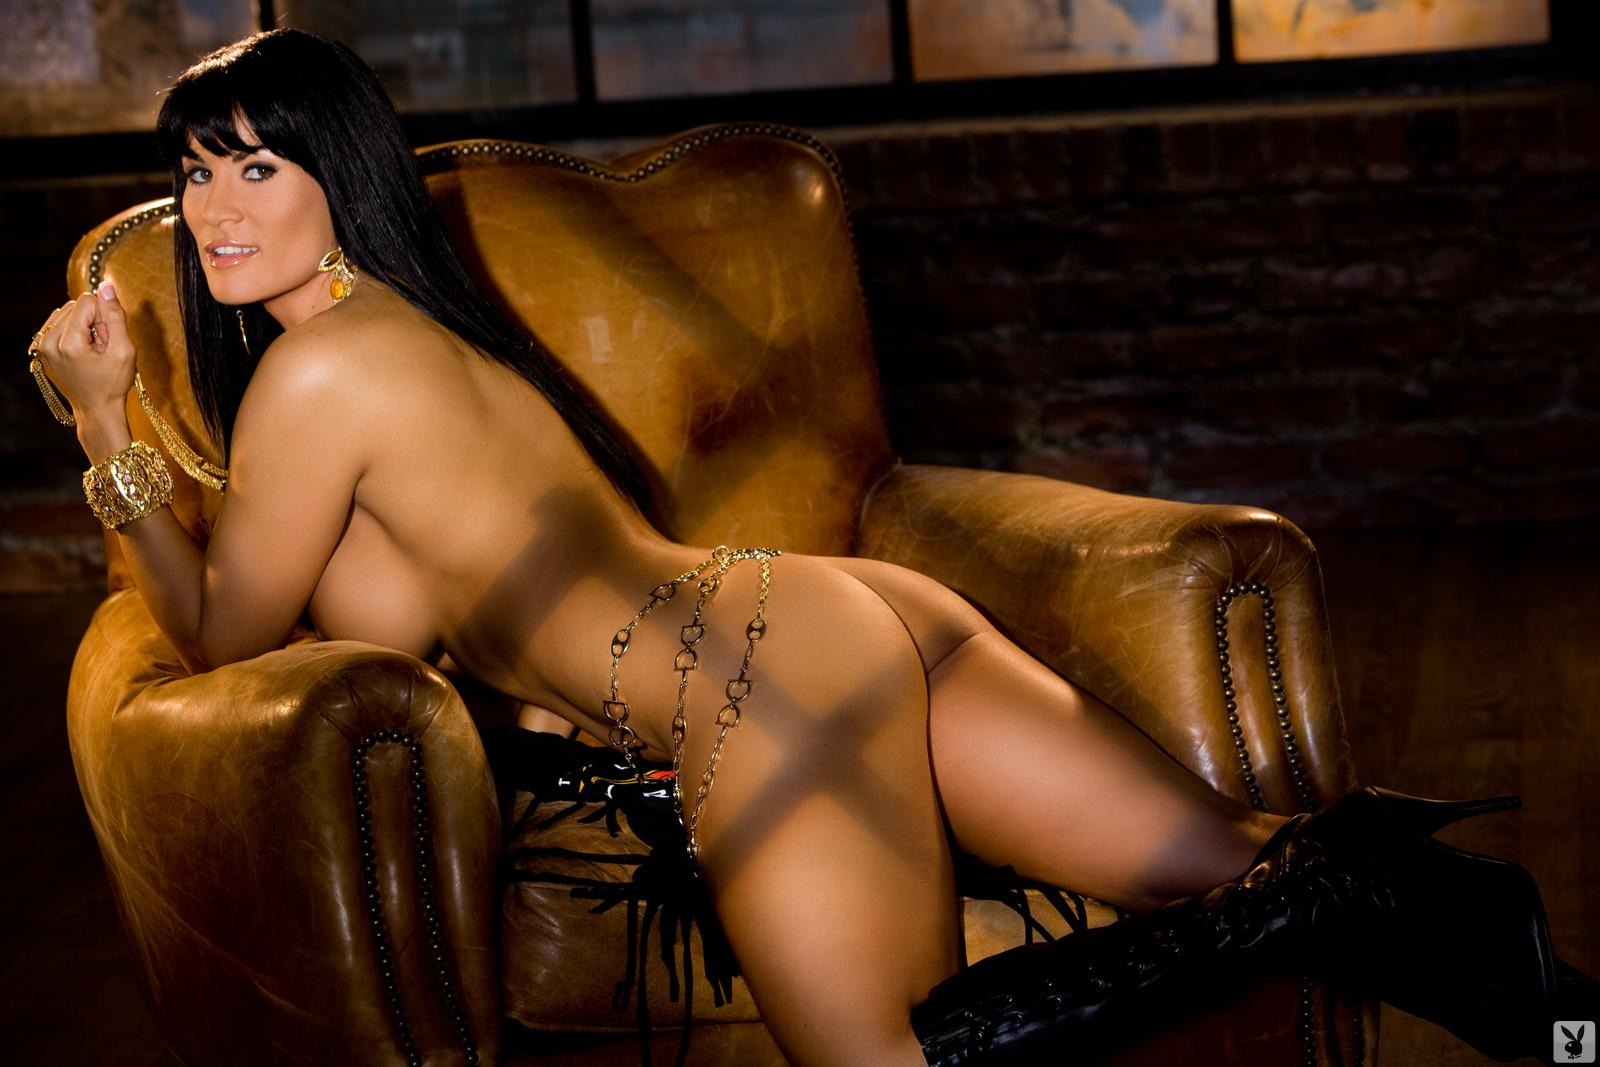 Gail Kim Professional Wrestler Nudes - 95 Pics - xHamster